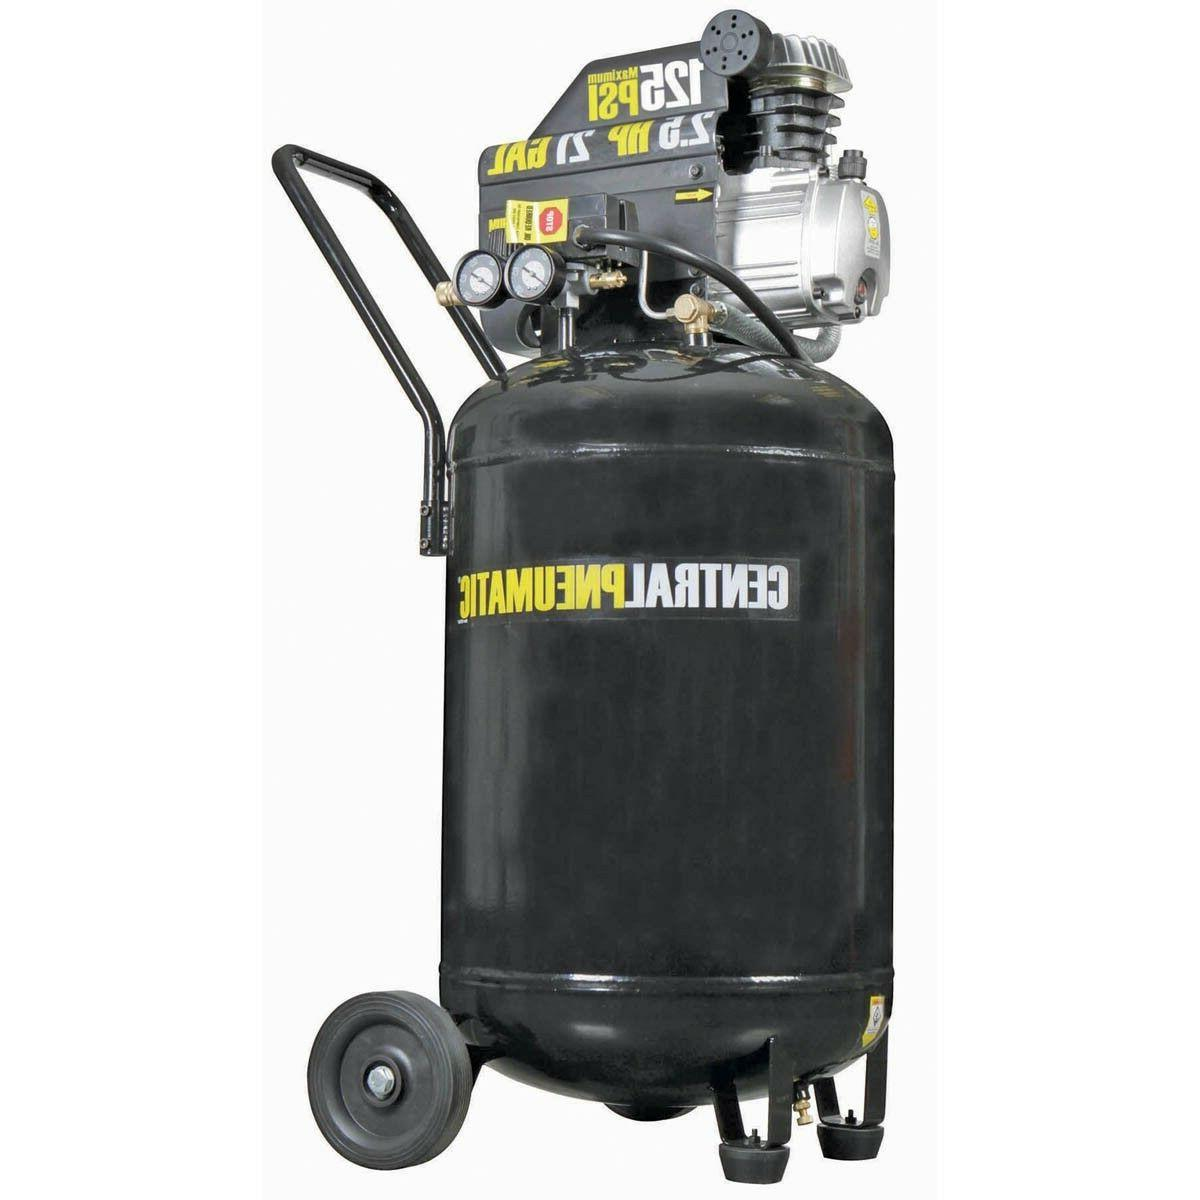 21 Gallon 125 PSI Cast Iron Vertical Air Compressor 2.5 HP M